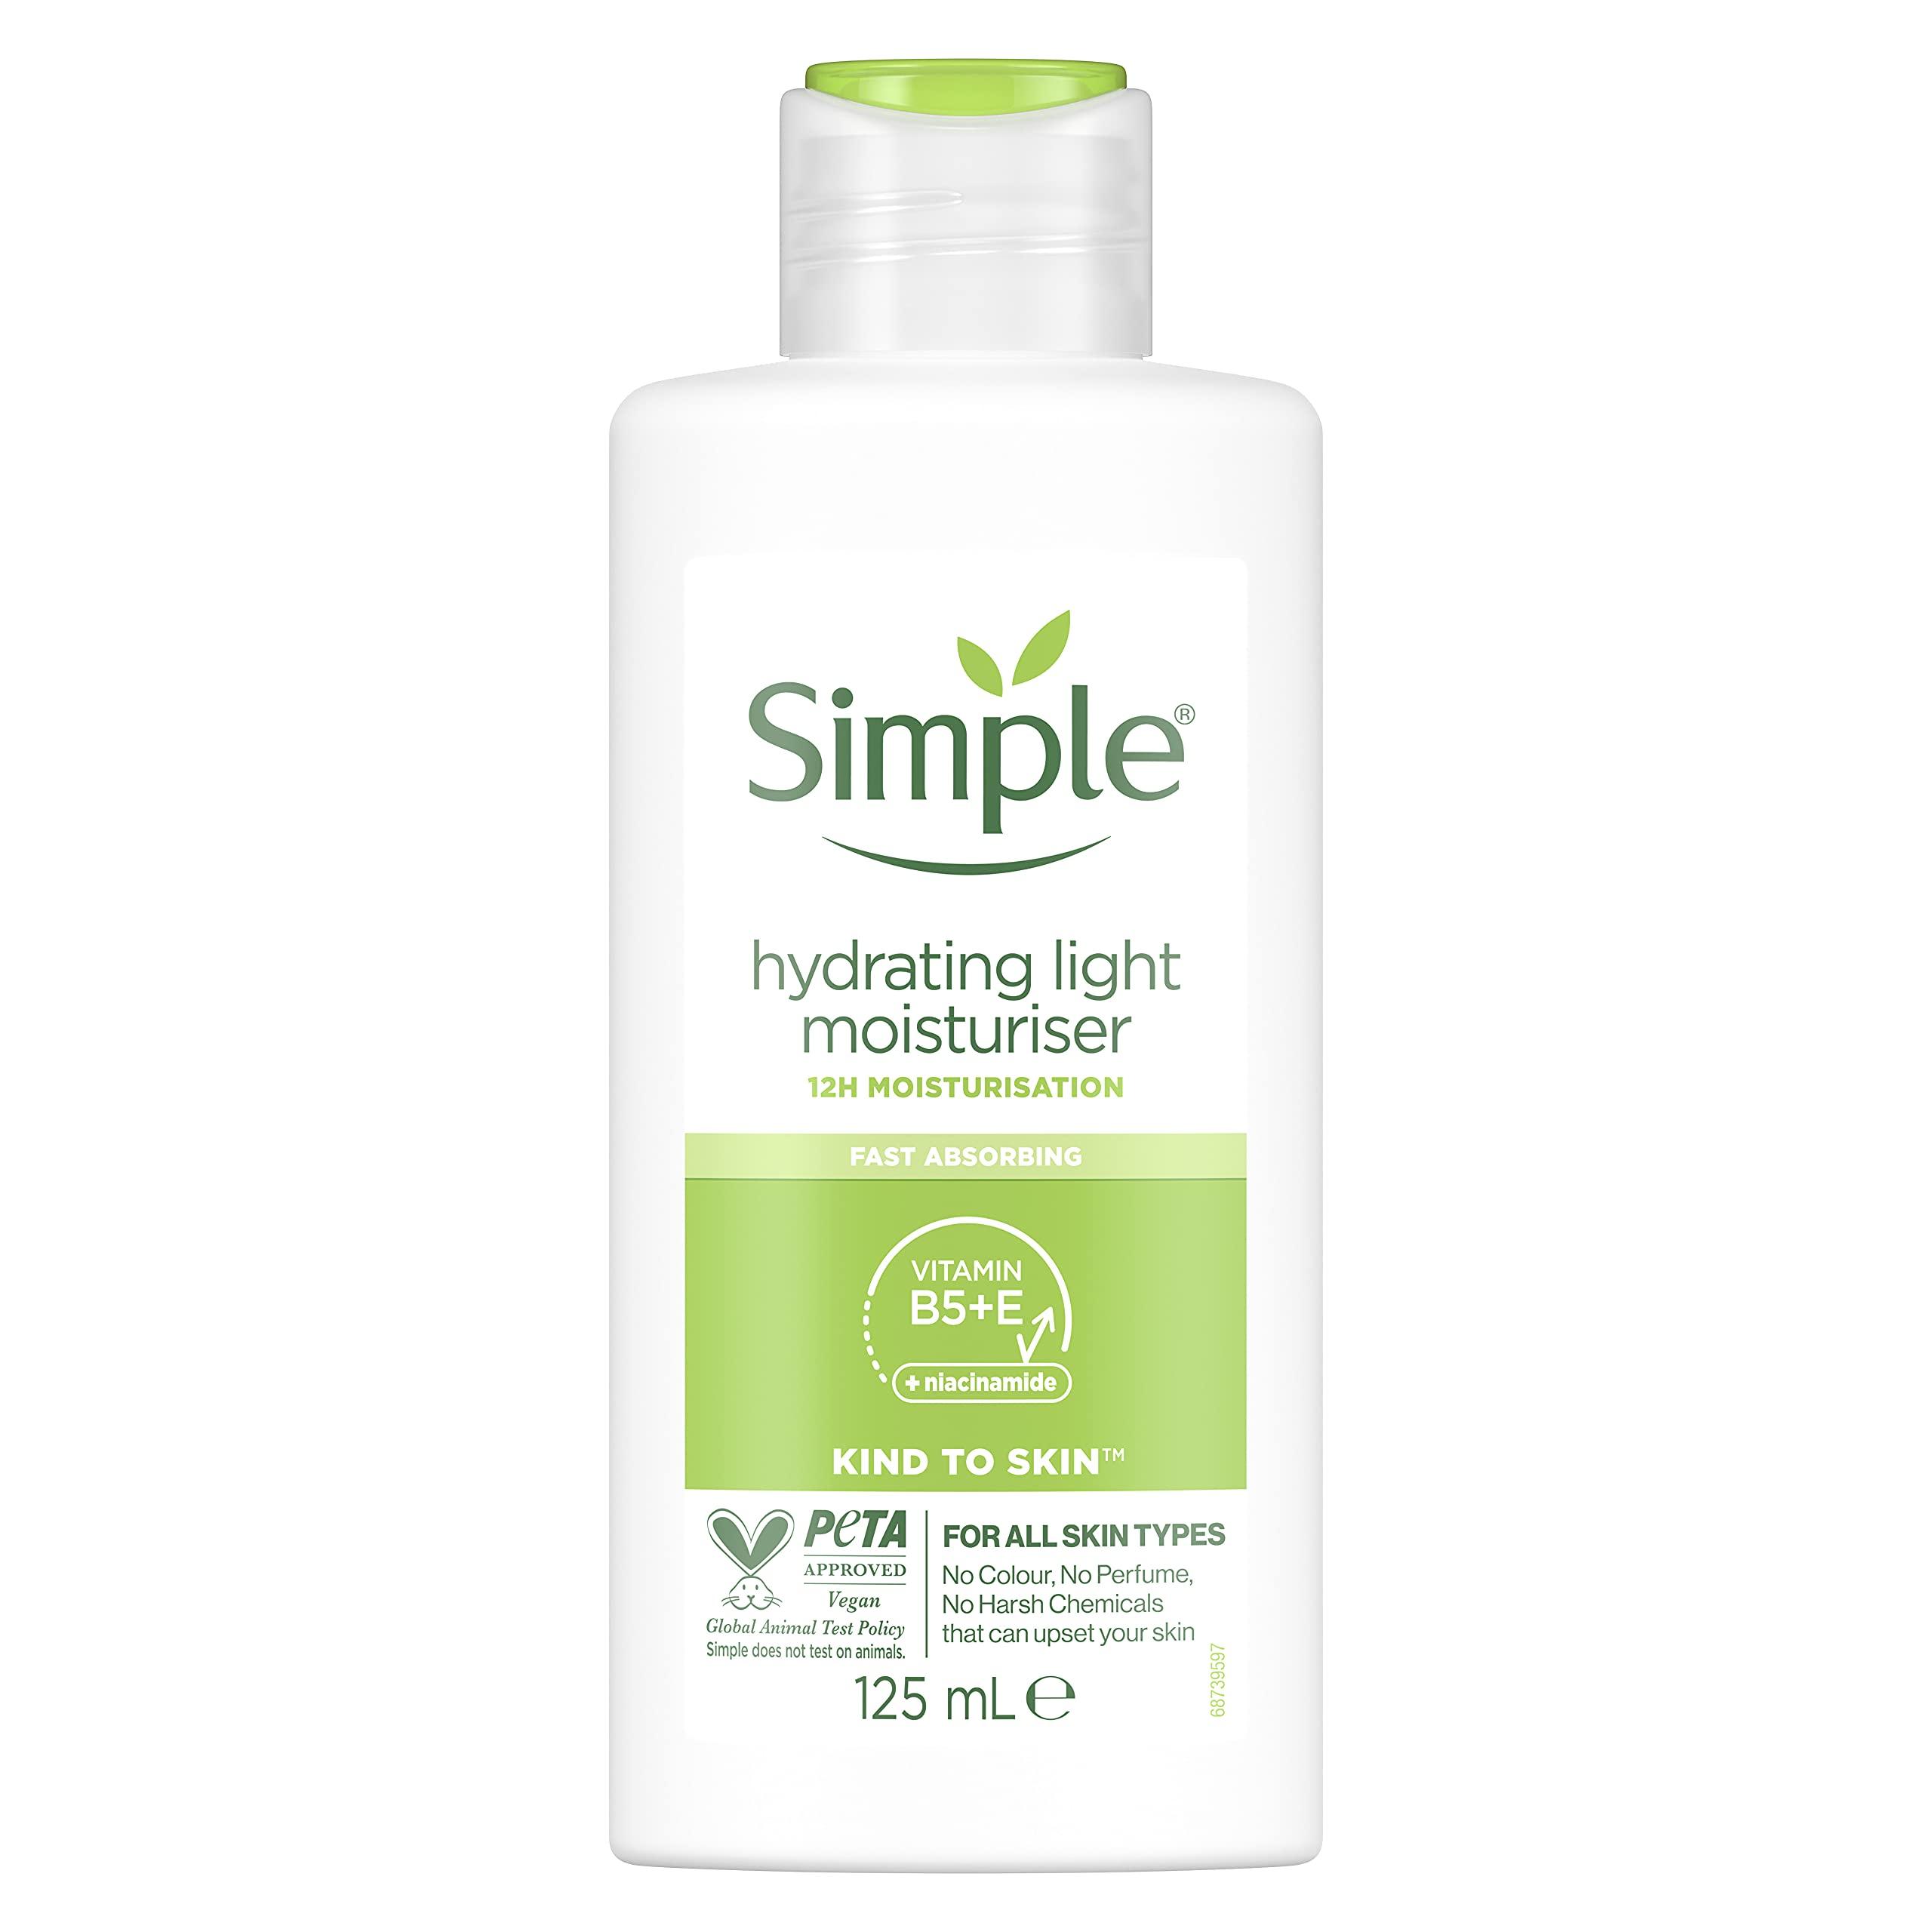 Simple Kind to Skin Hydrating Light UK's #1 Facial Skin Care brand* Moisturiser for 12-hour Moisturisation 125 ml